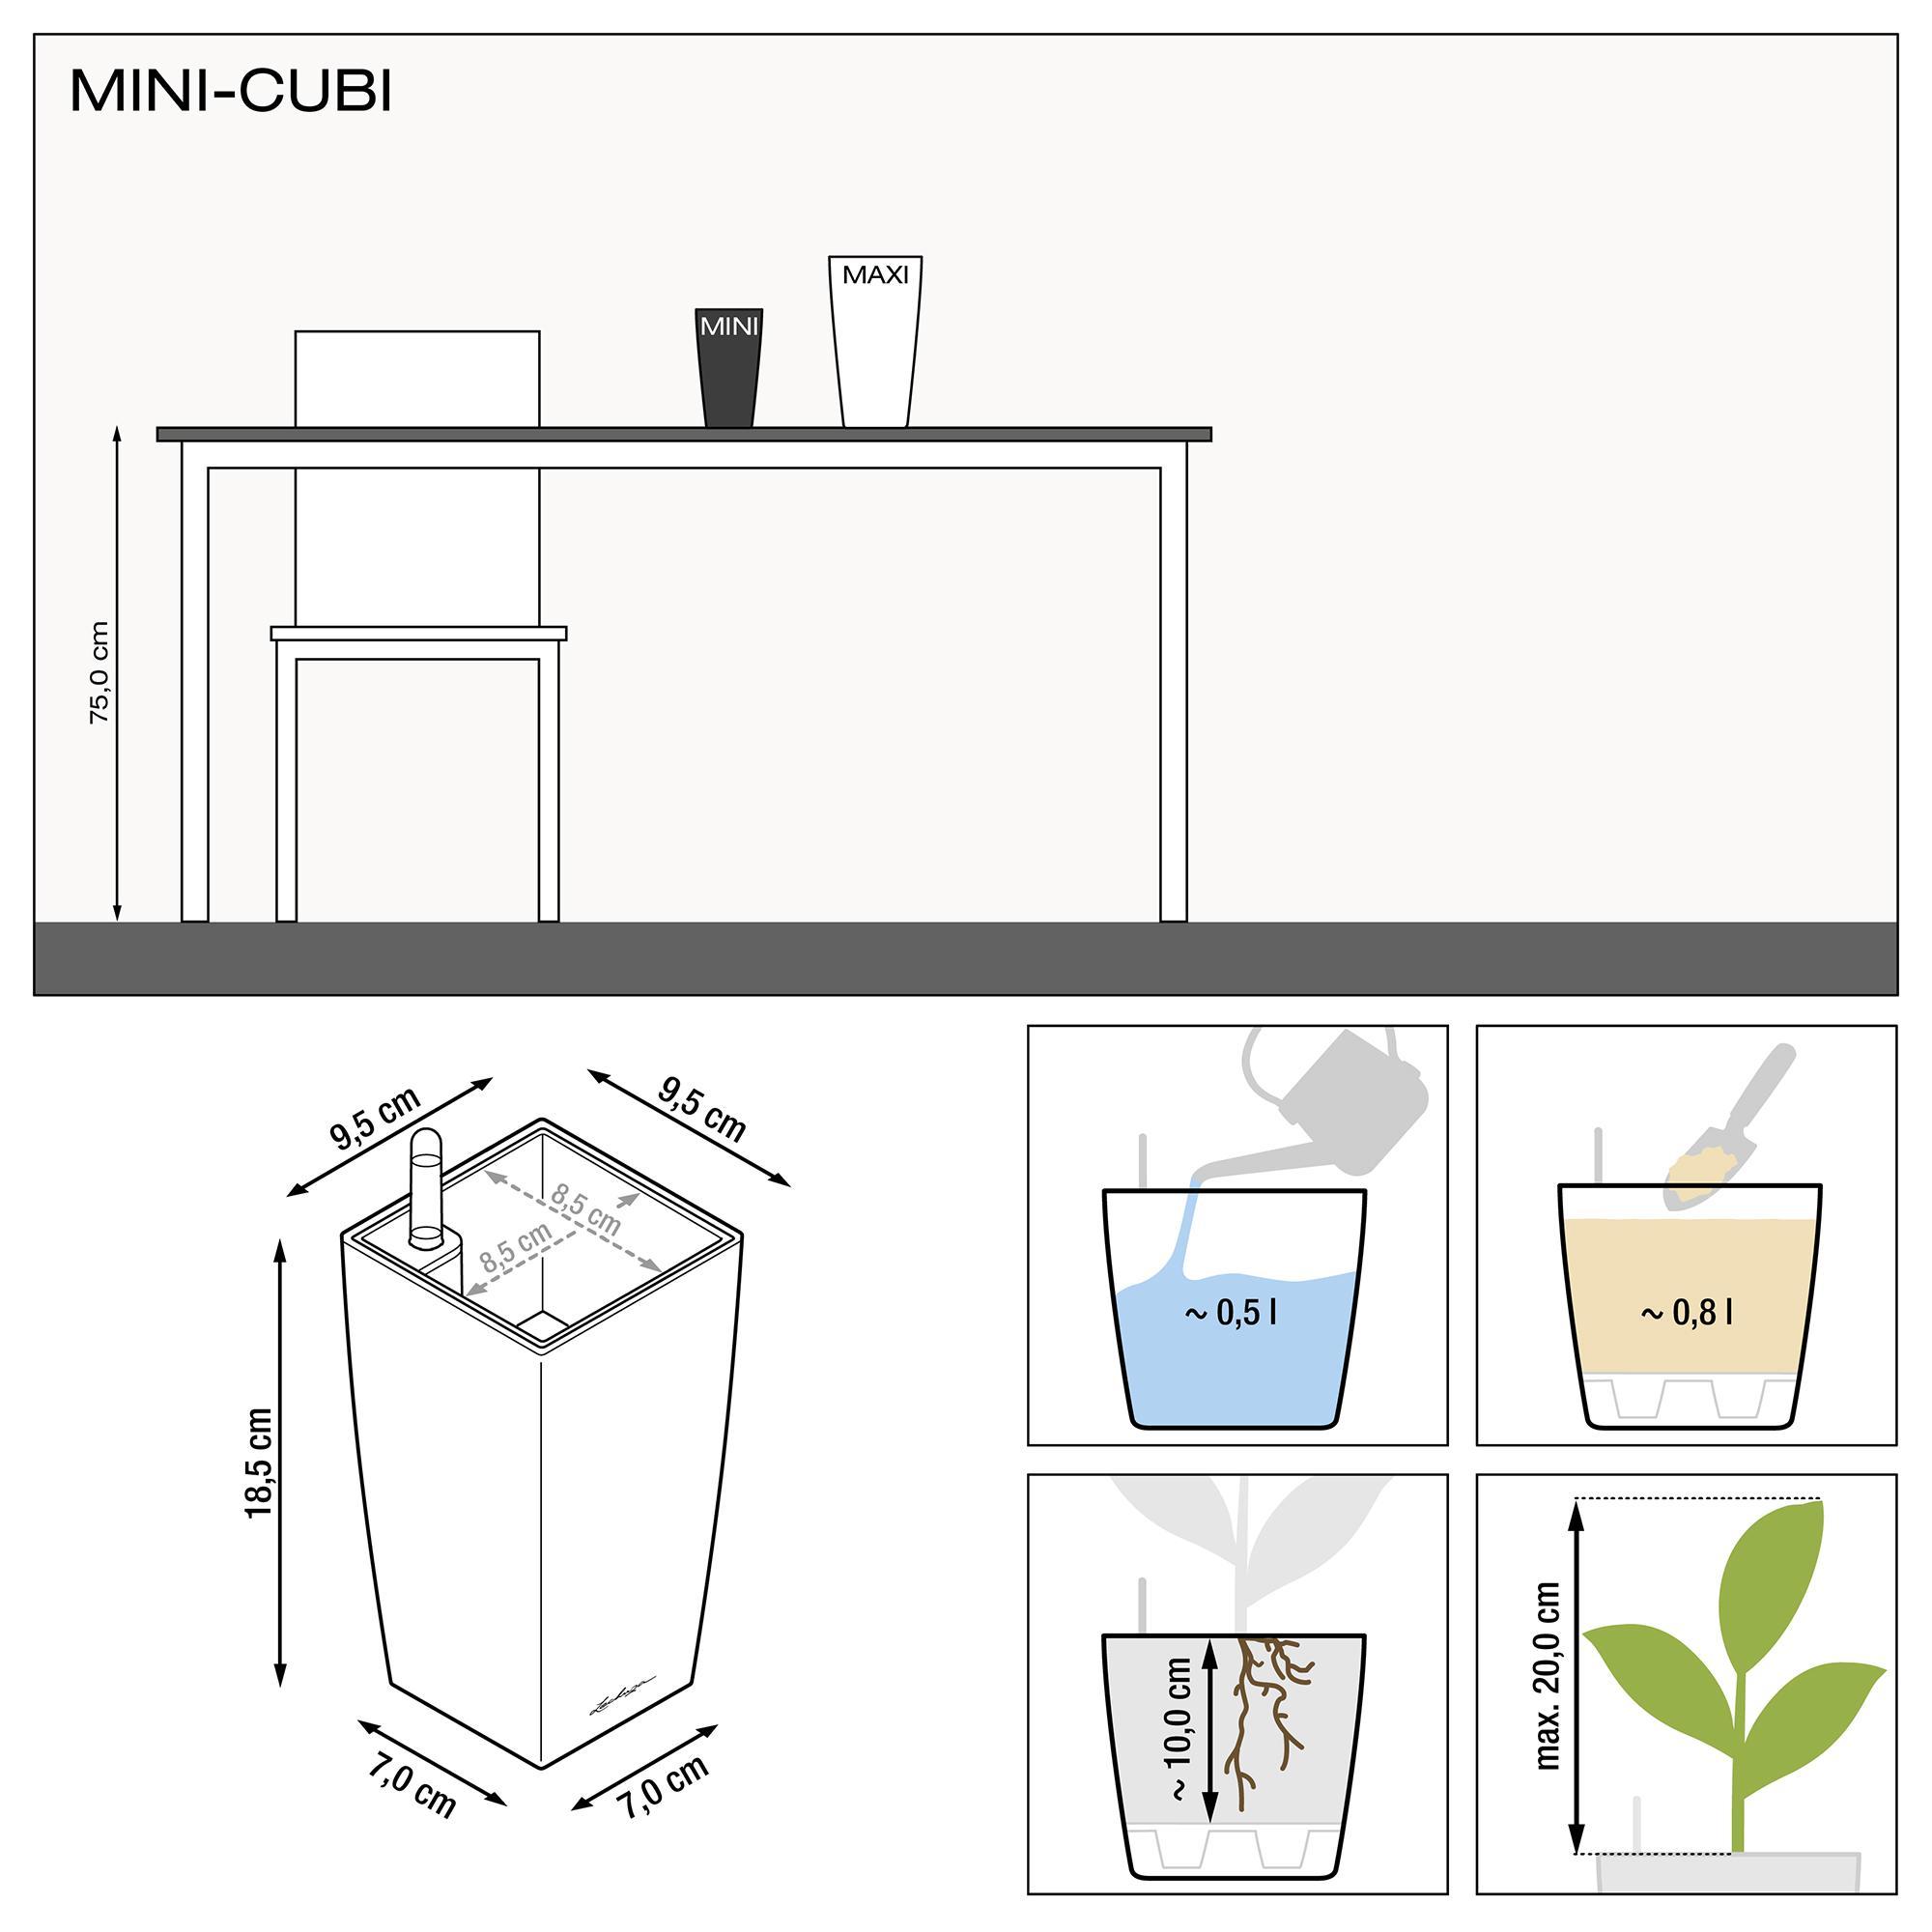 MINI-CUBI charcoal metallic - Image 3